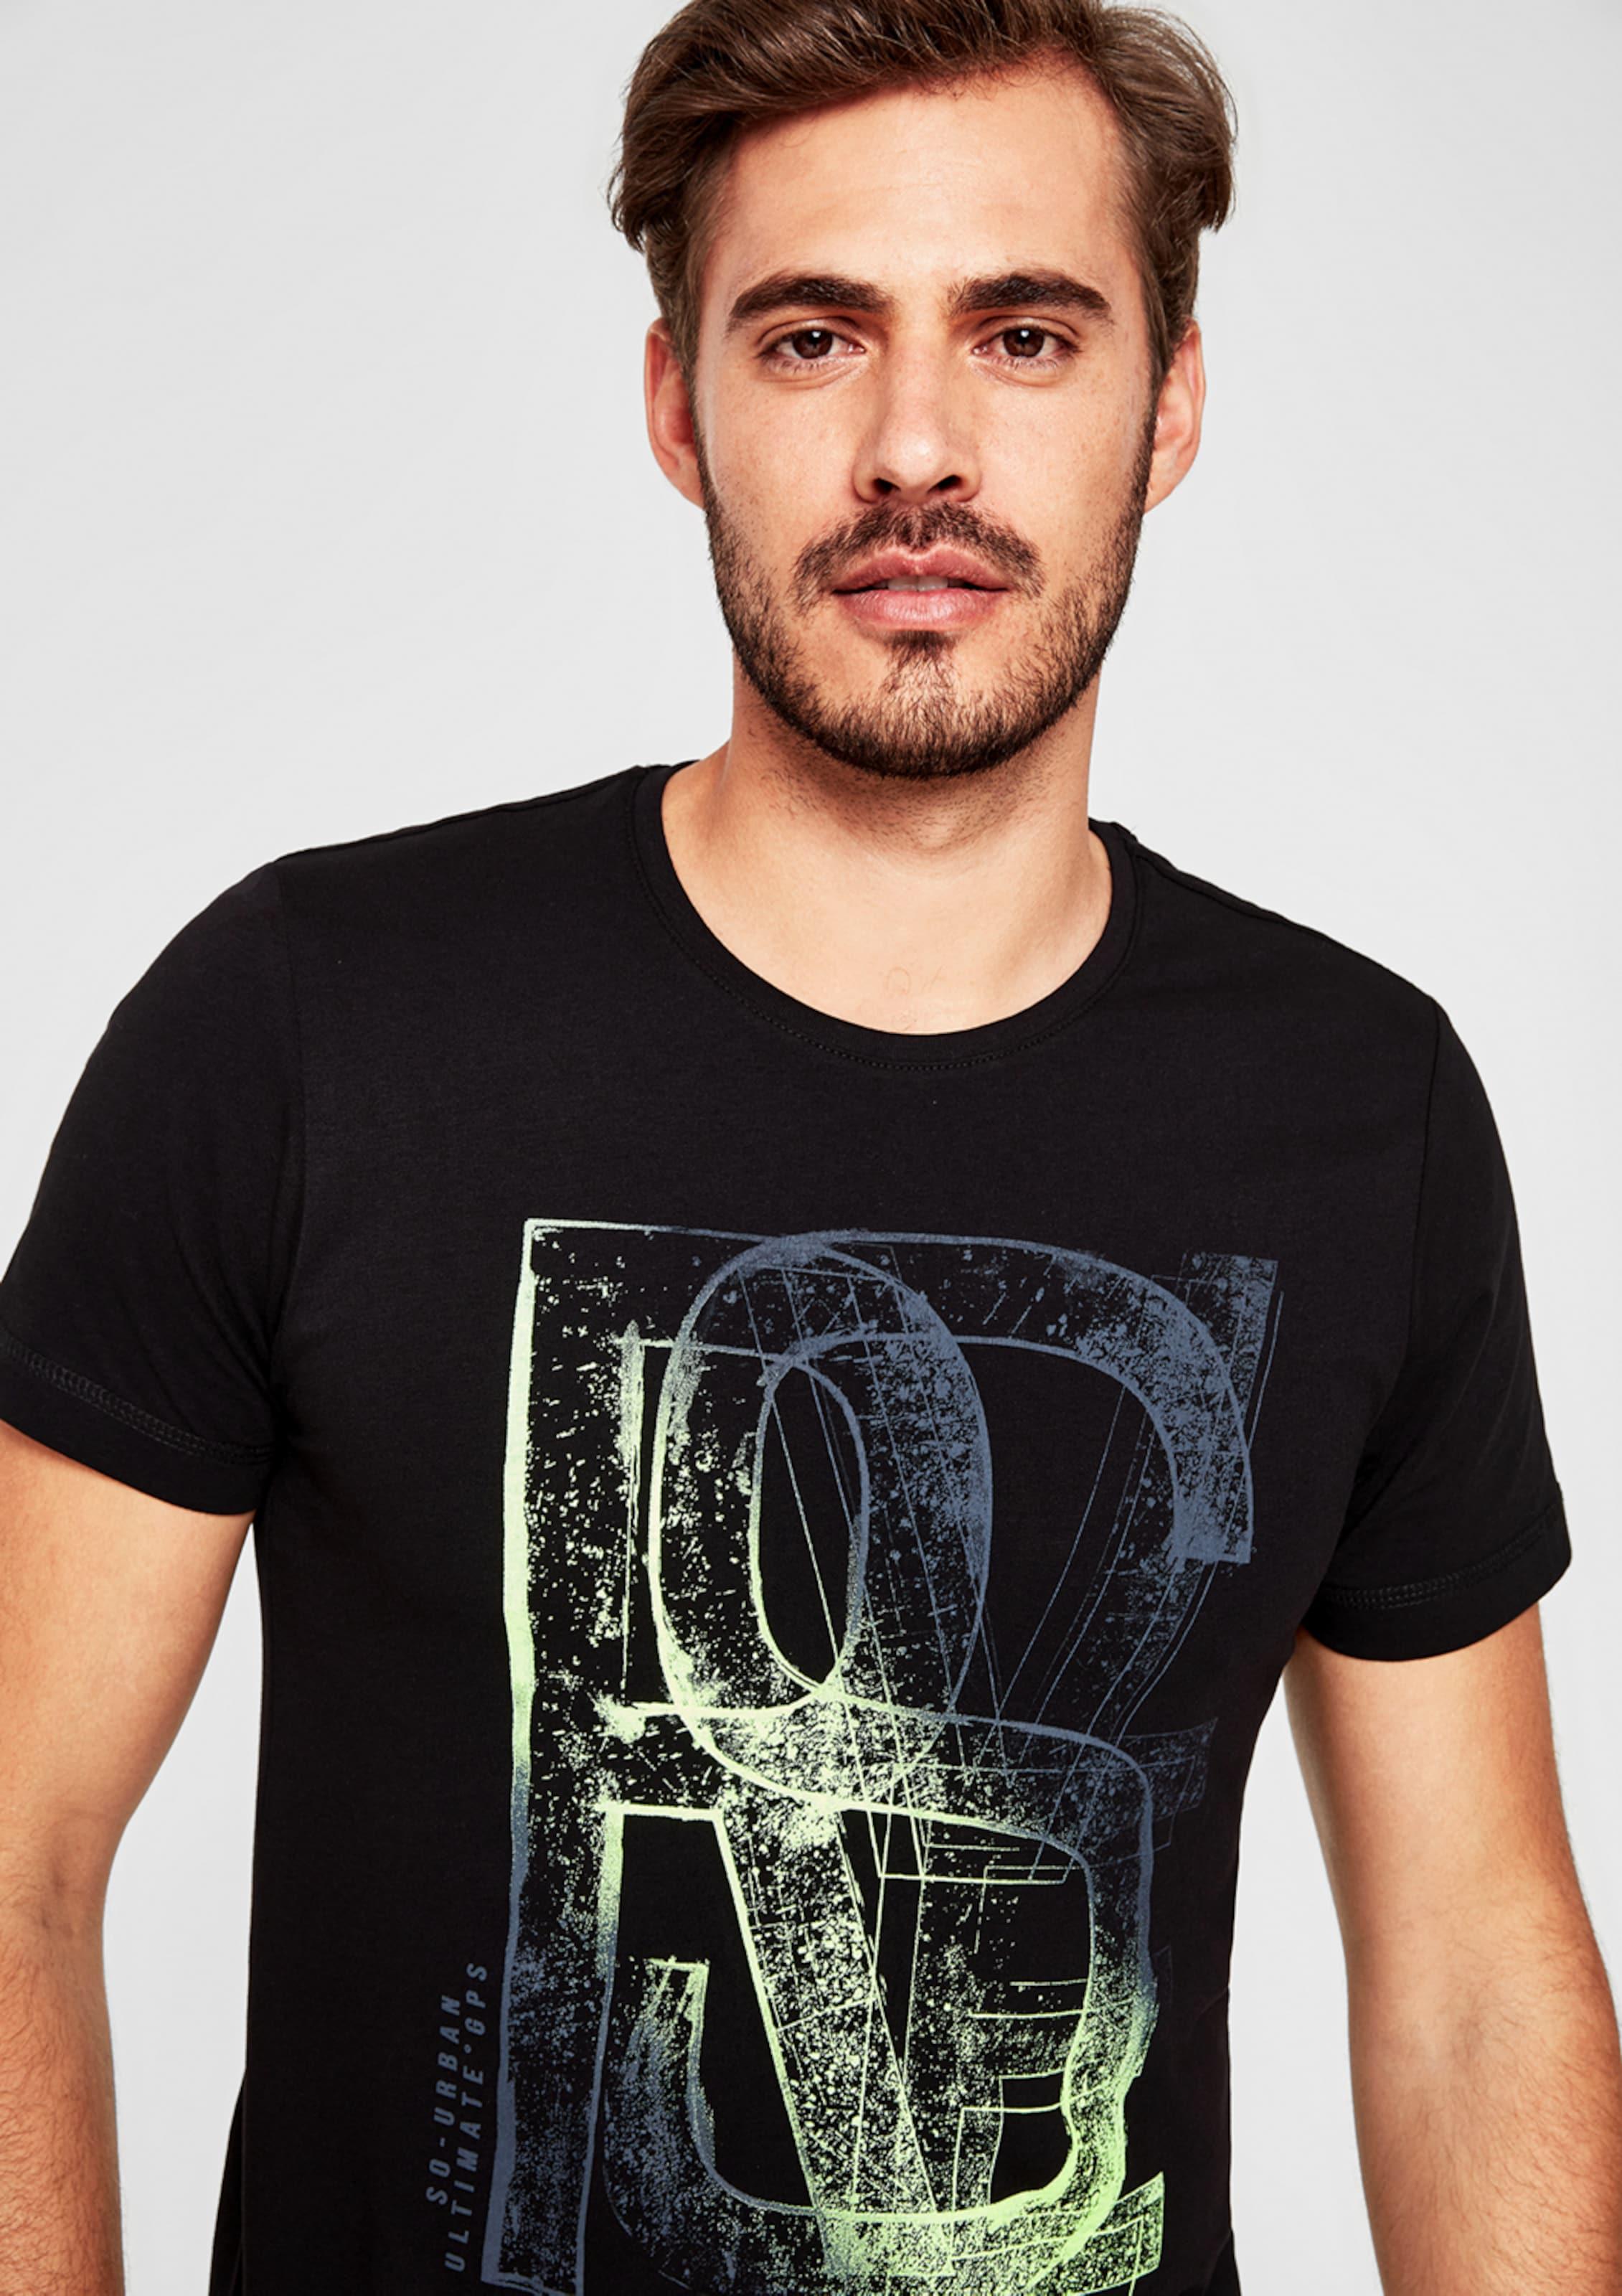 T Schwarz oliver shirt In HimmelblauHellgrün S wXn0P8kO